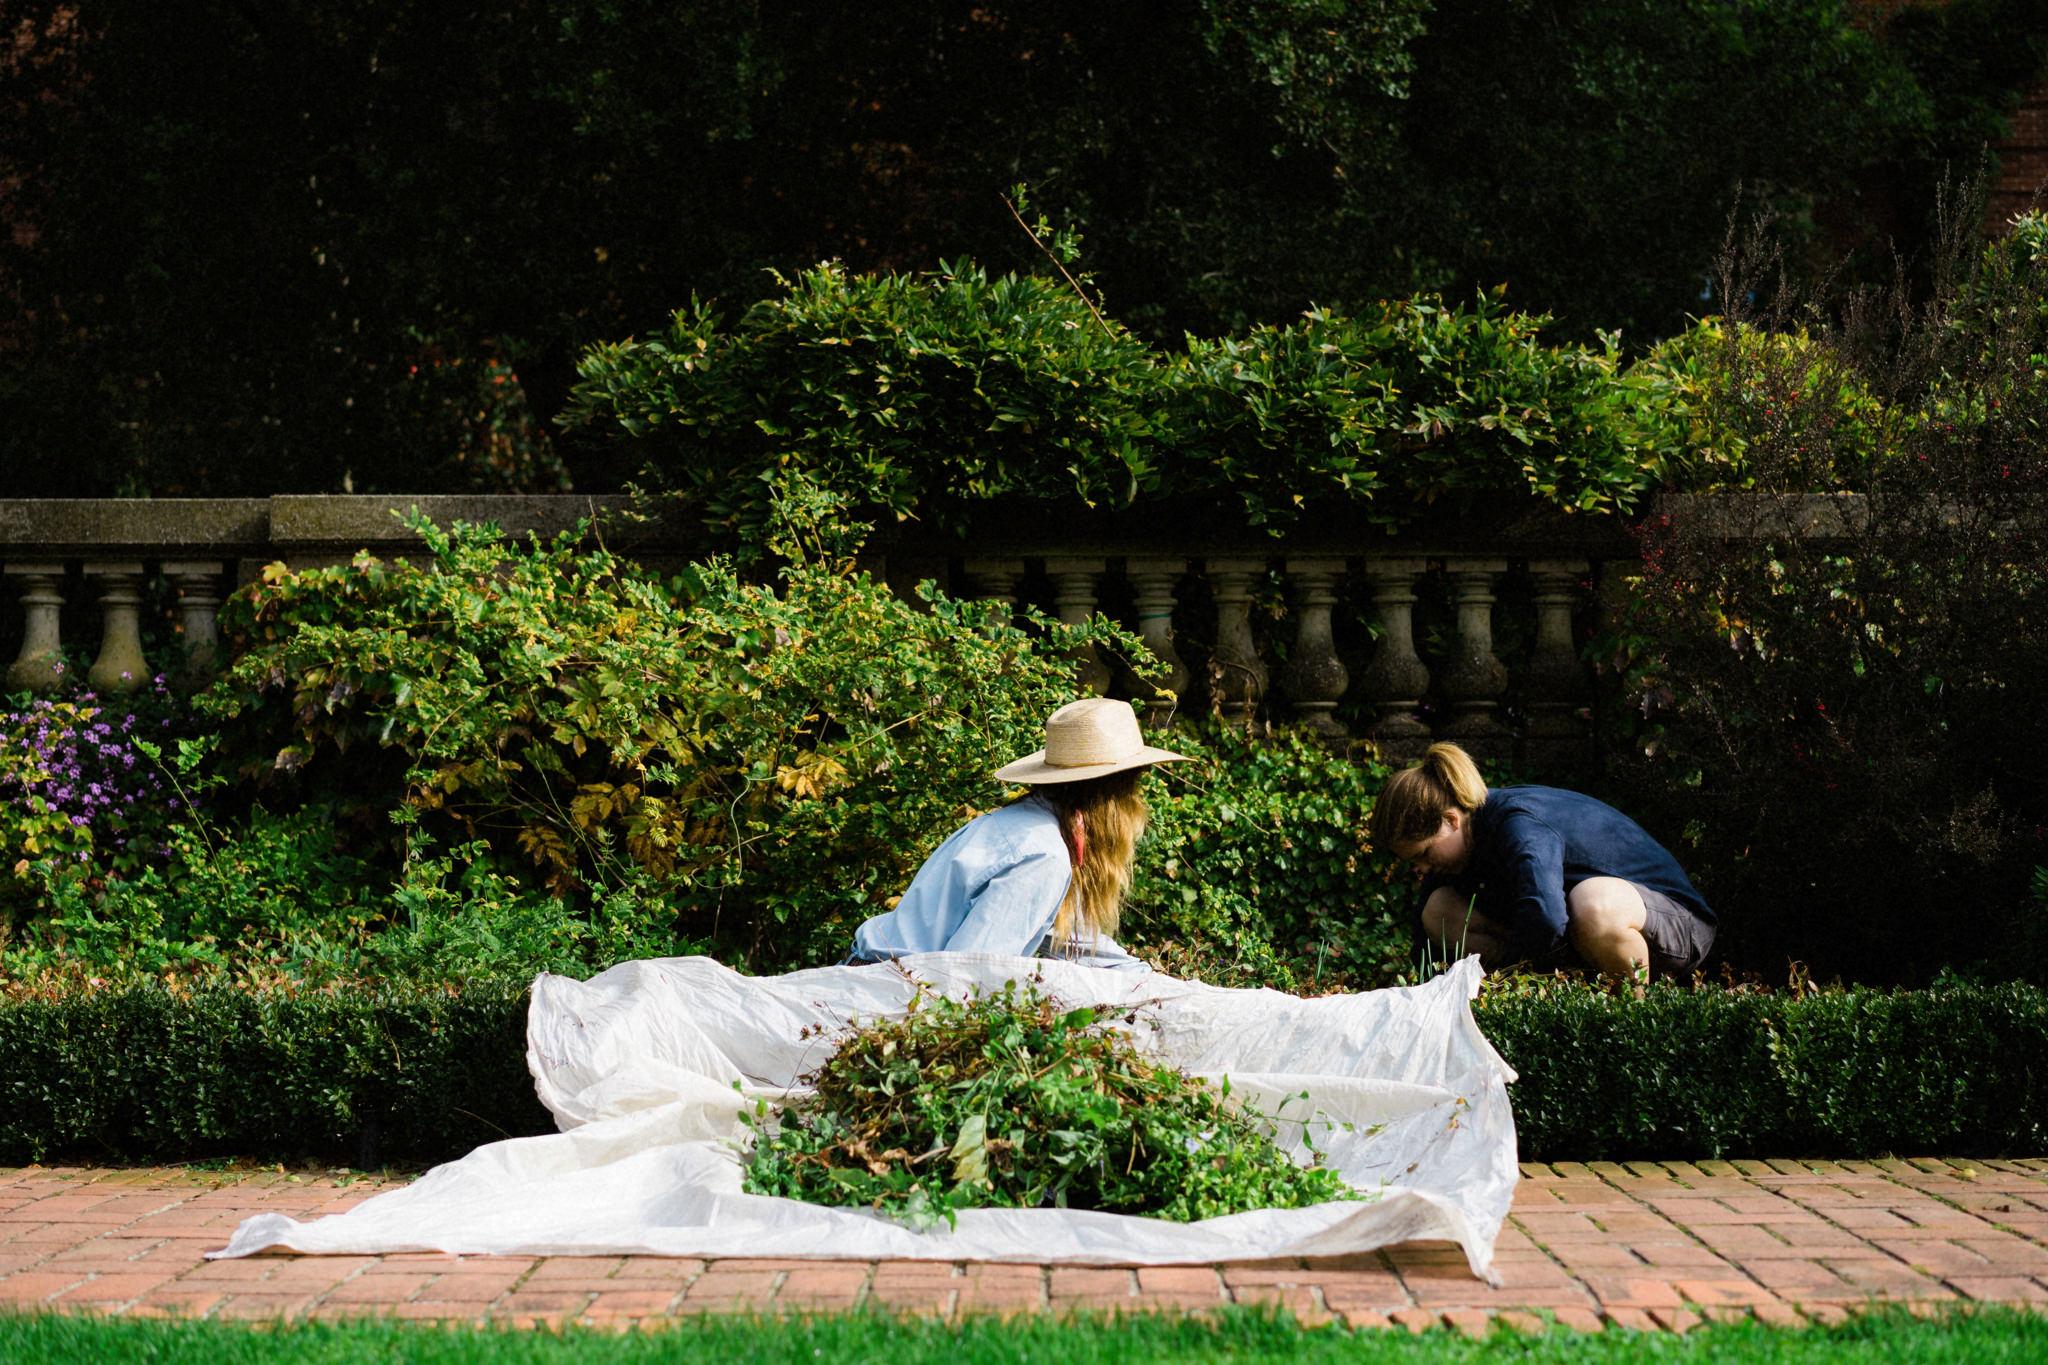 filoli garden photo